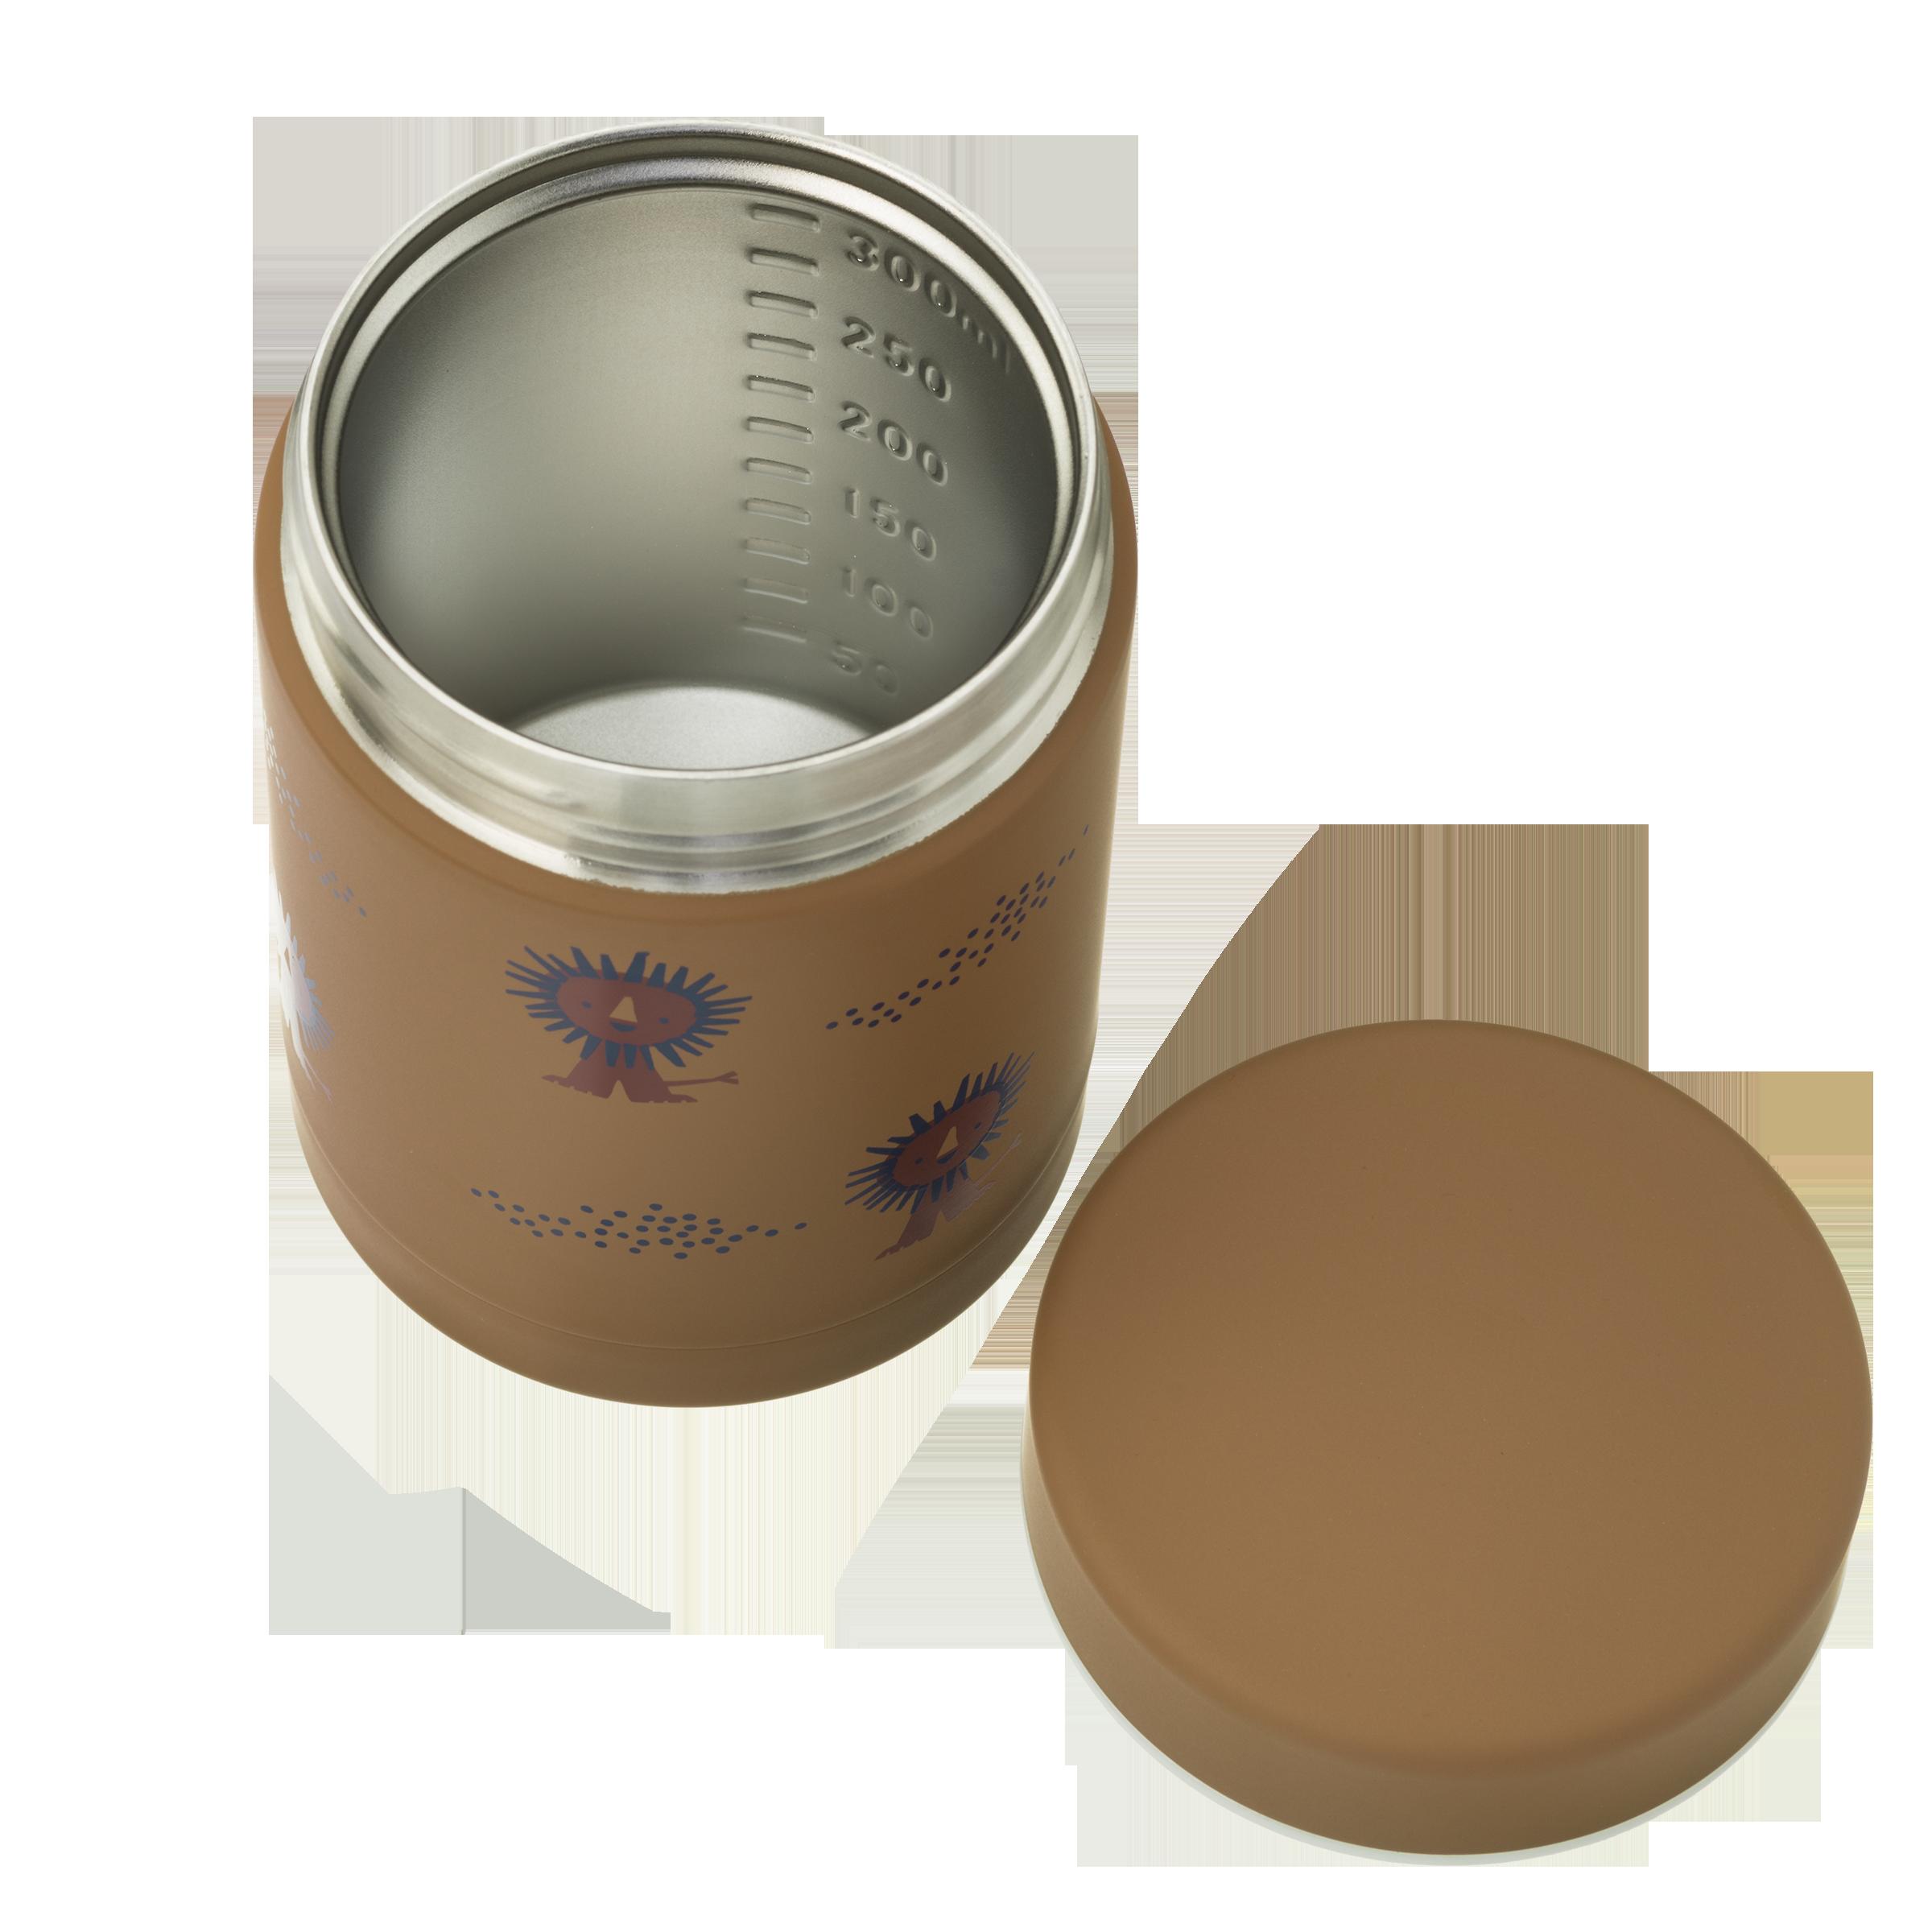 Afbeelding Fresk Thermische Foodbox I Lion